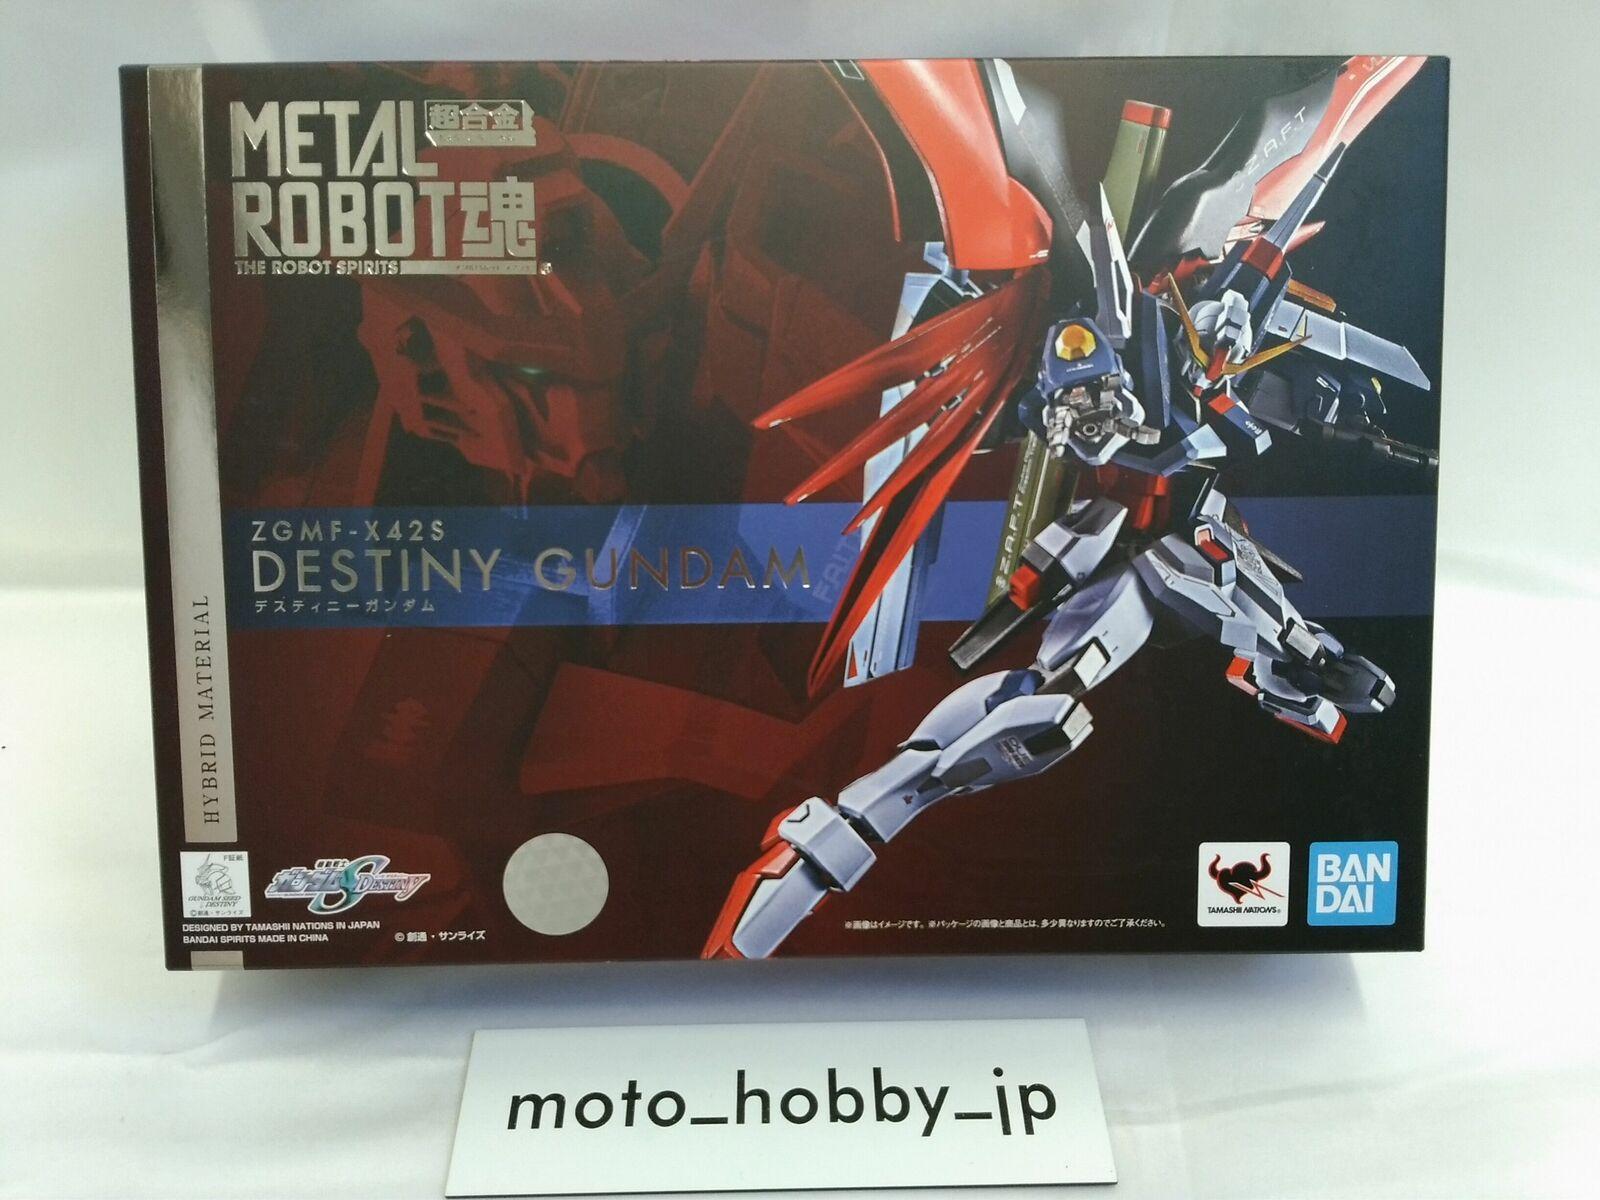 Beai Mettuttio Robot Spirits Laterale  Ms Destiny Gundam 140mm azione cifra da  offrendo il 100%